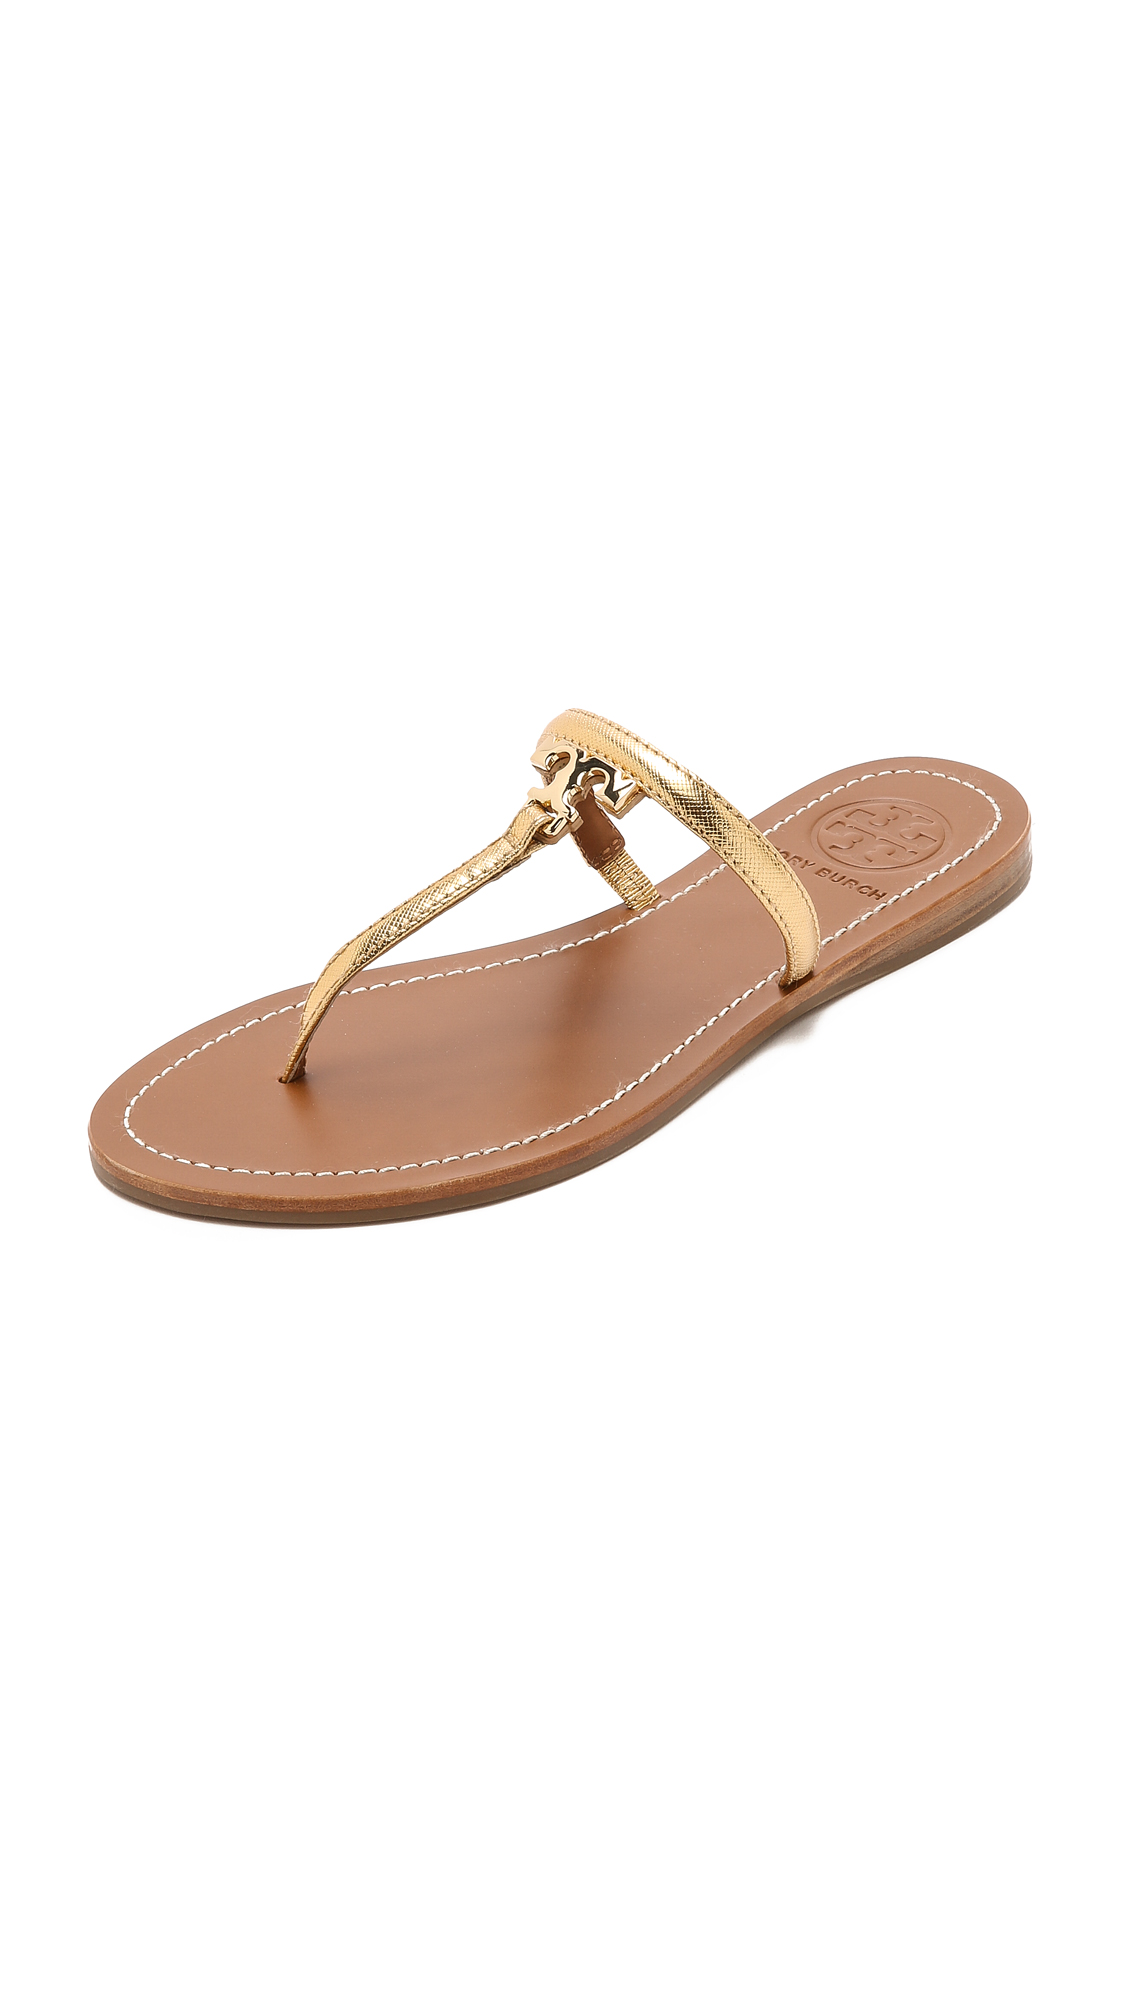 119d6b872c14 Tory Burch T Logo Flat Thong Sandals on PopScreen